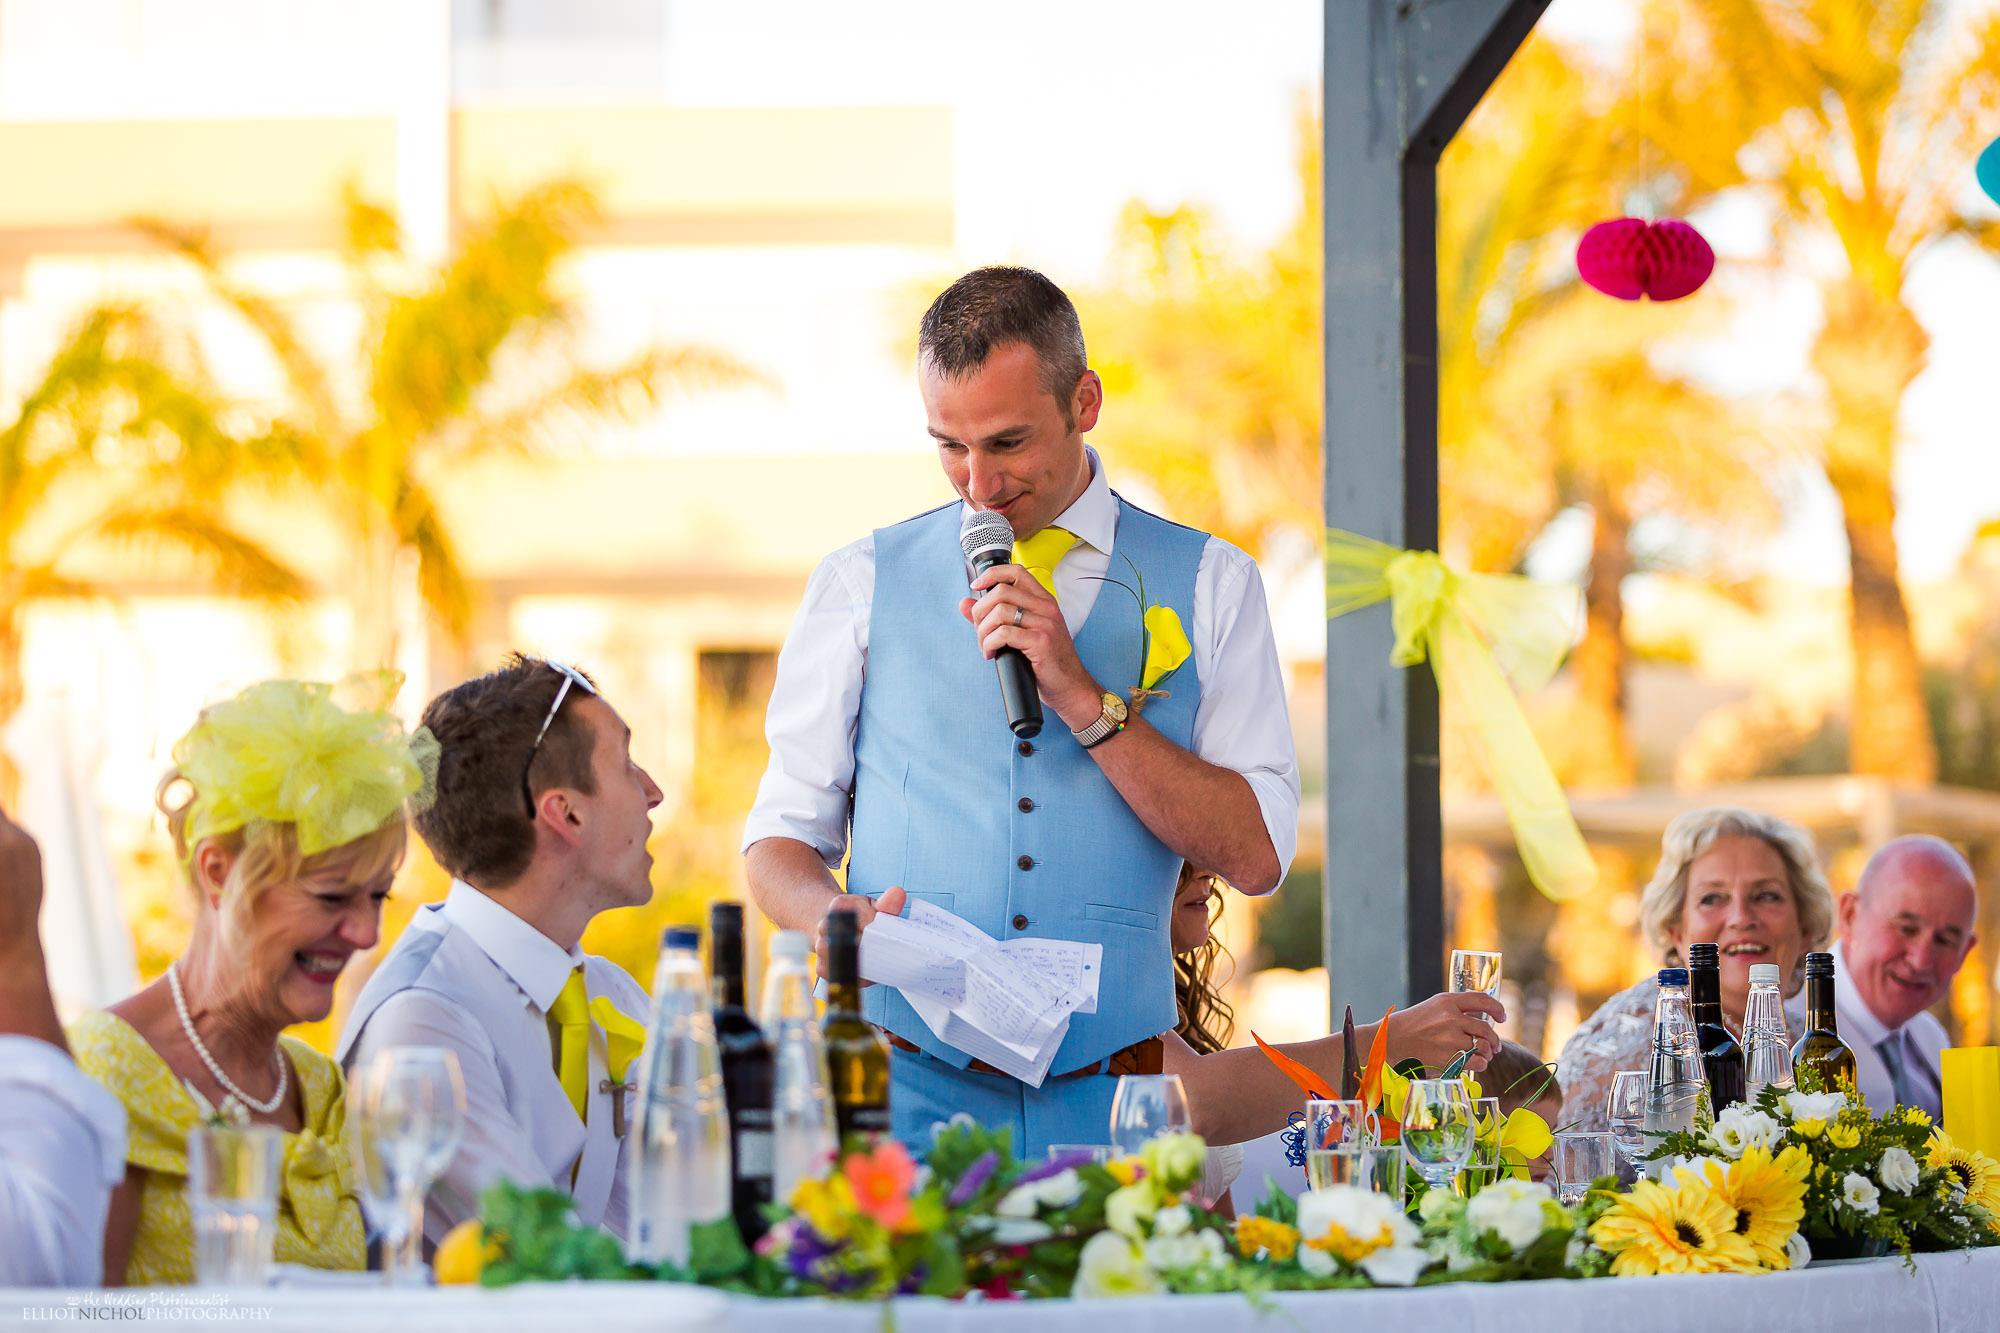 groom-wedding-day-speech-reception-photography